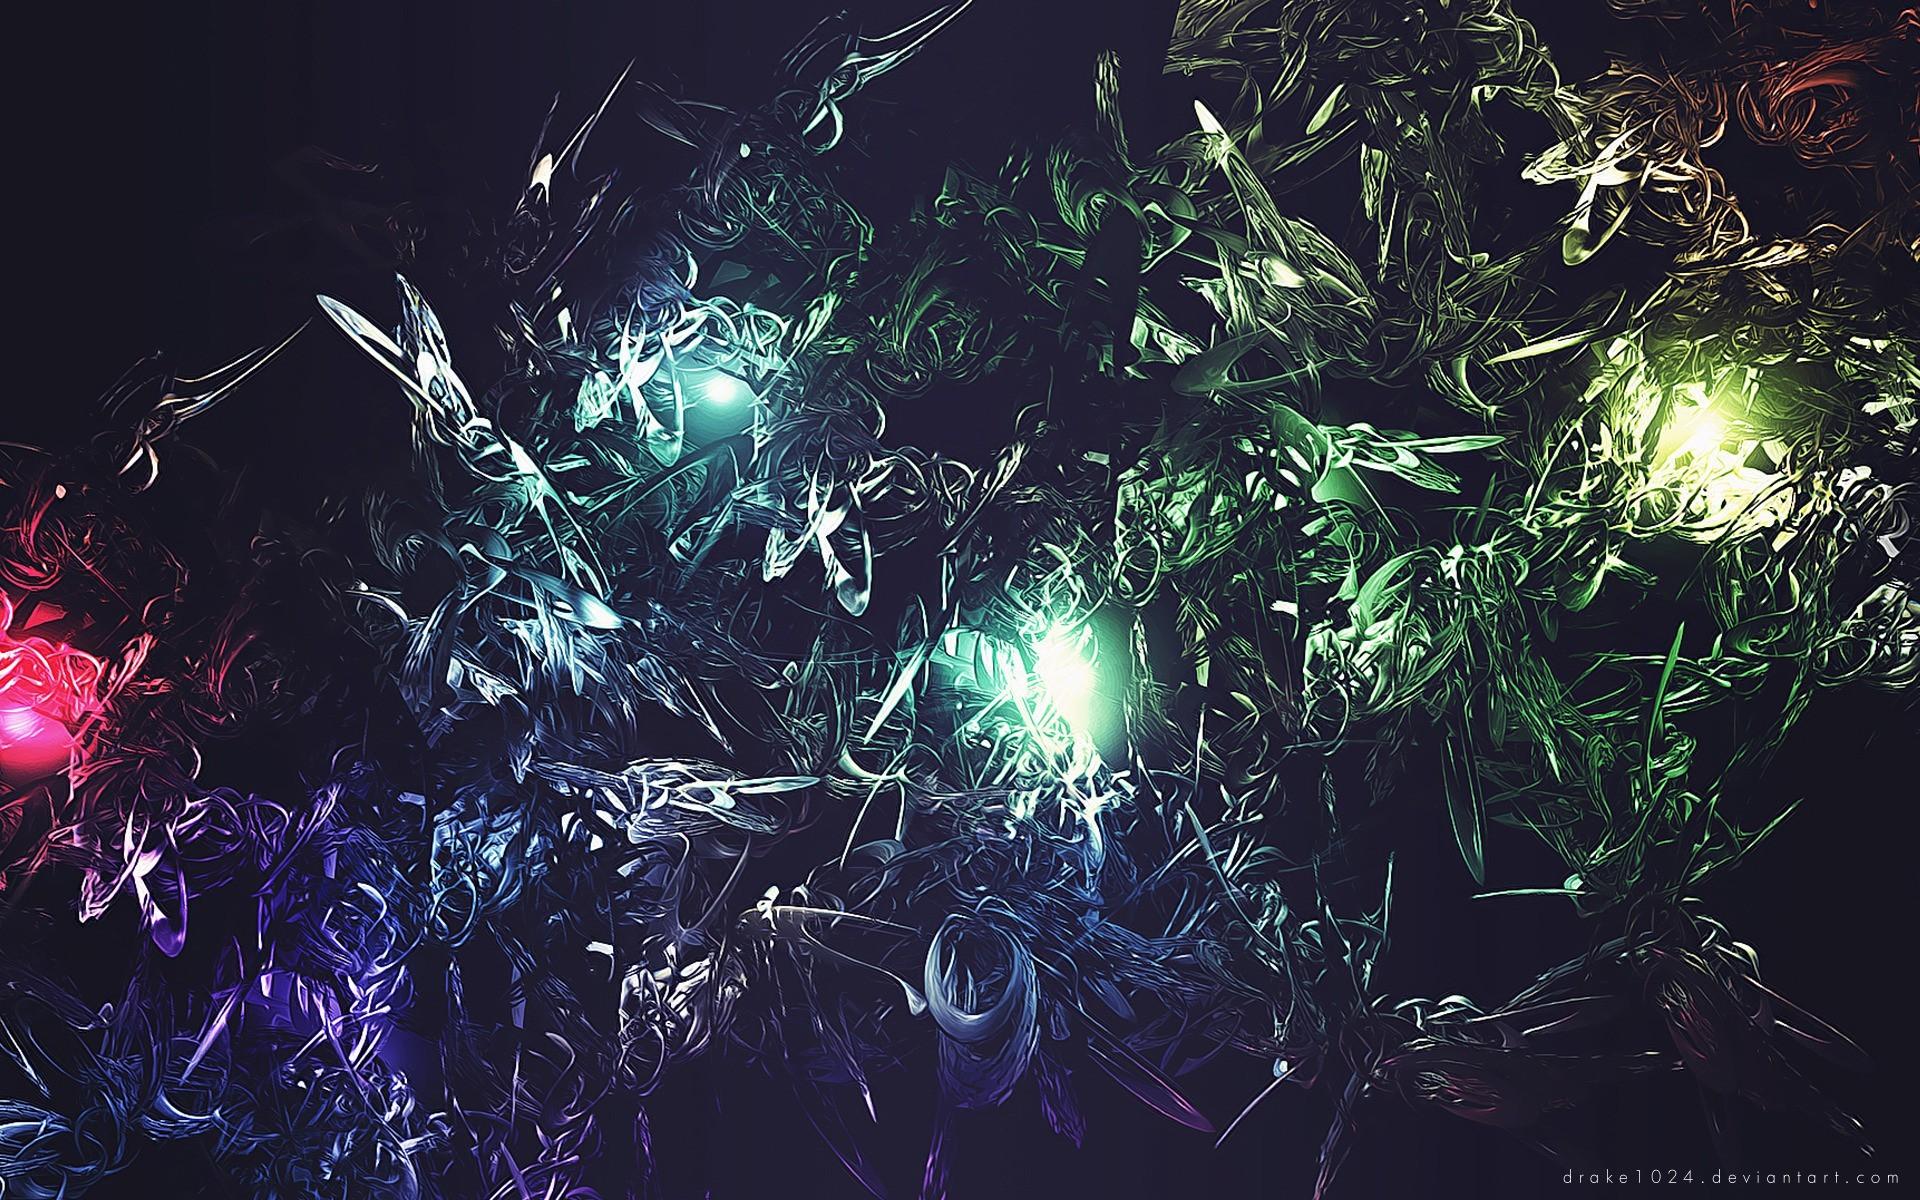 Glow in the Dark Wallpaper 67 images